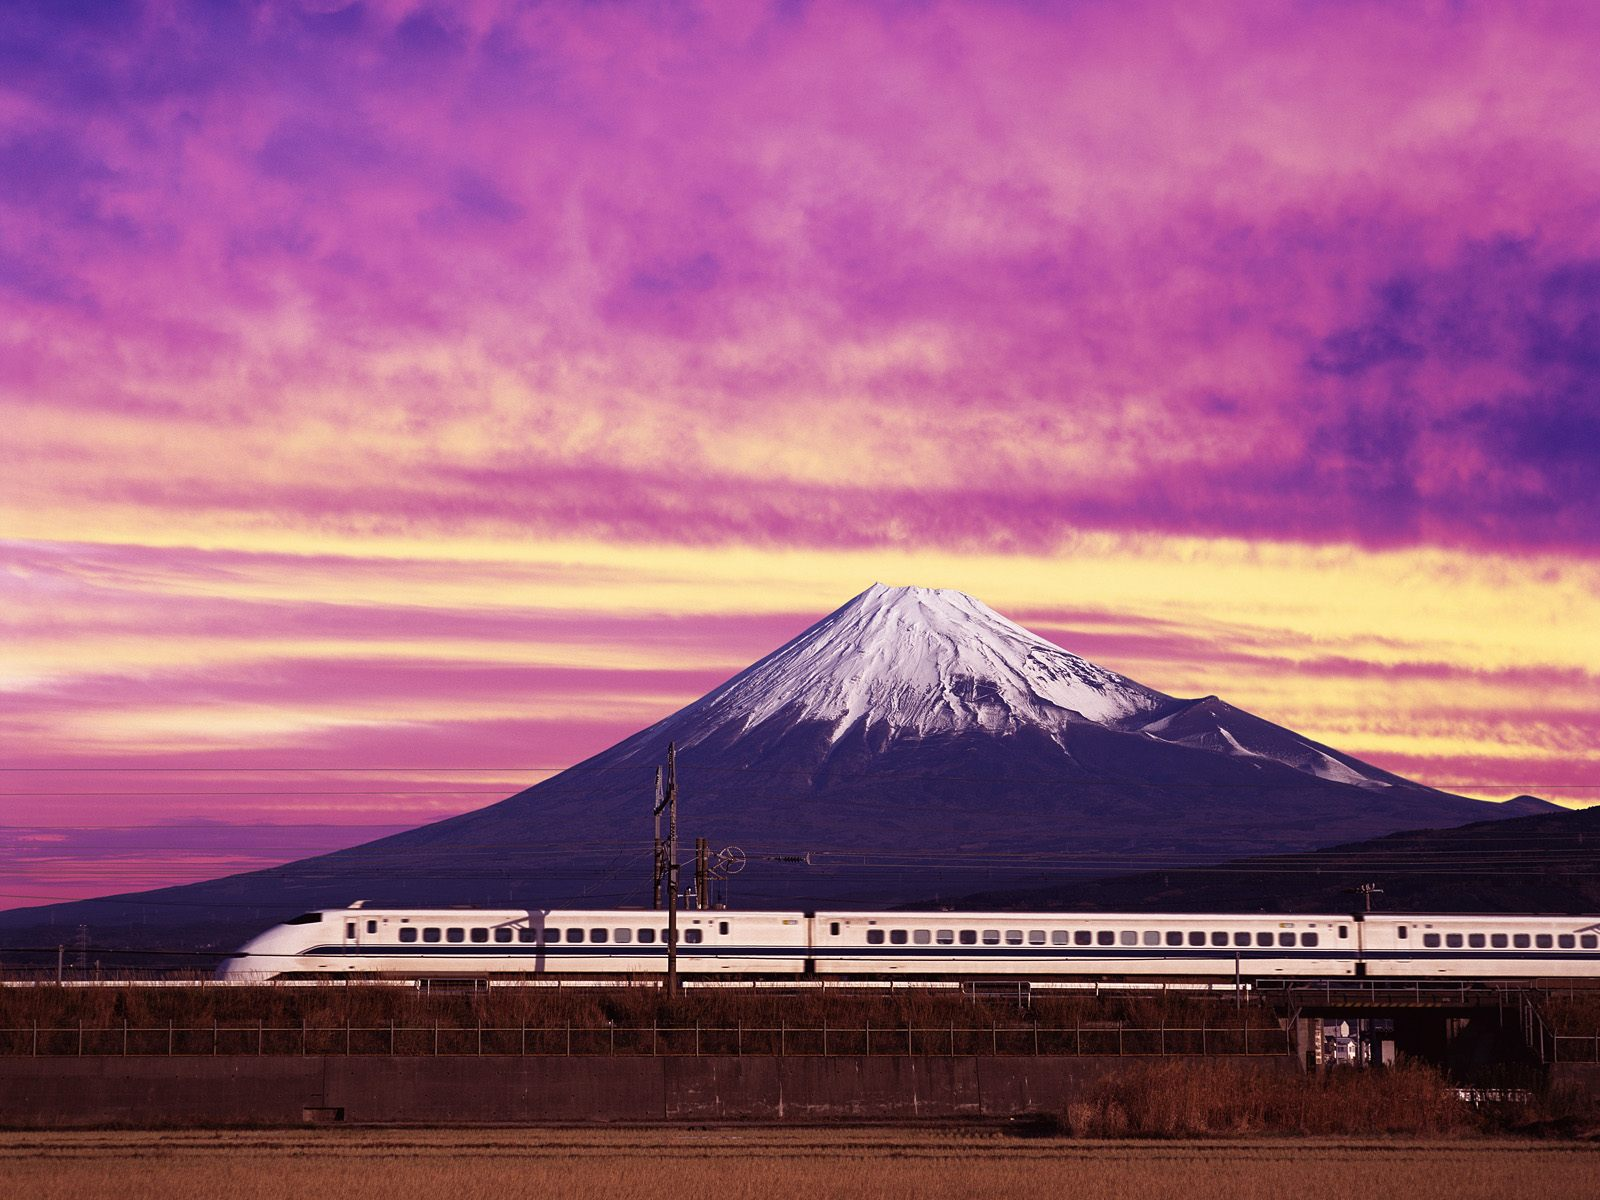 Drawn railroad shinkansen Trains bullet  and bullet